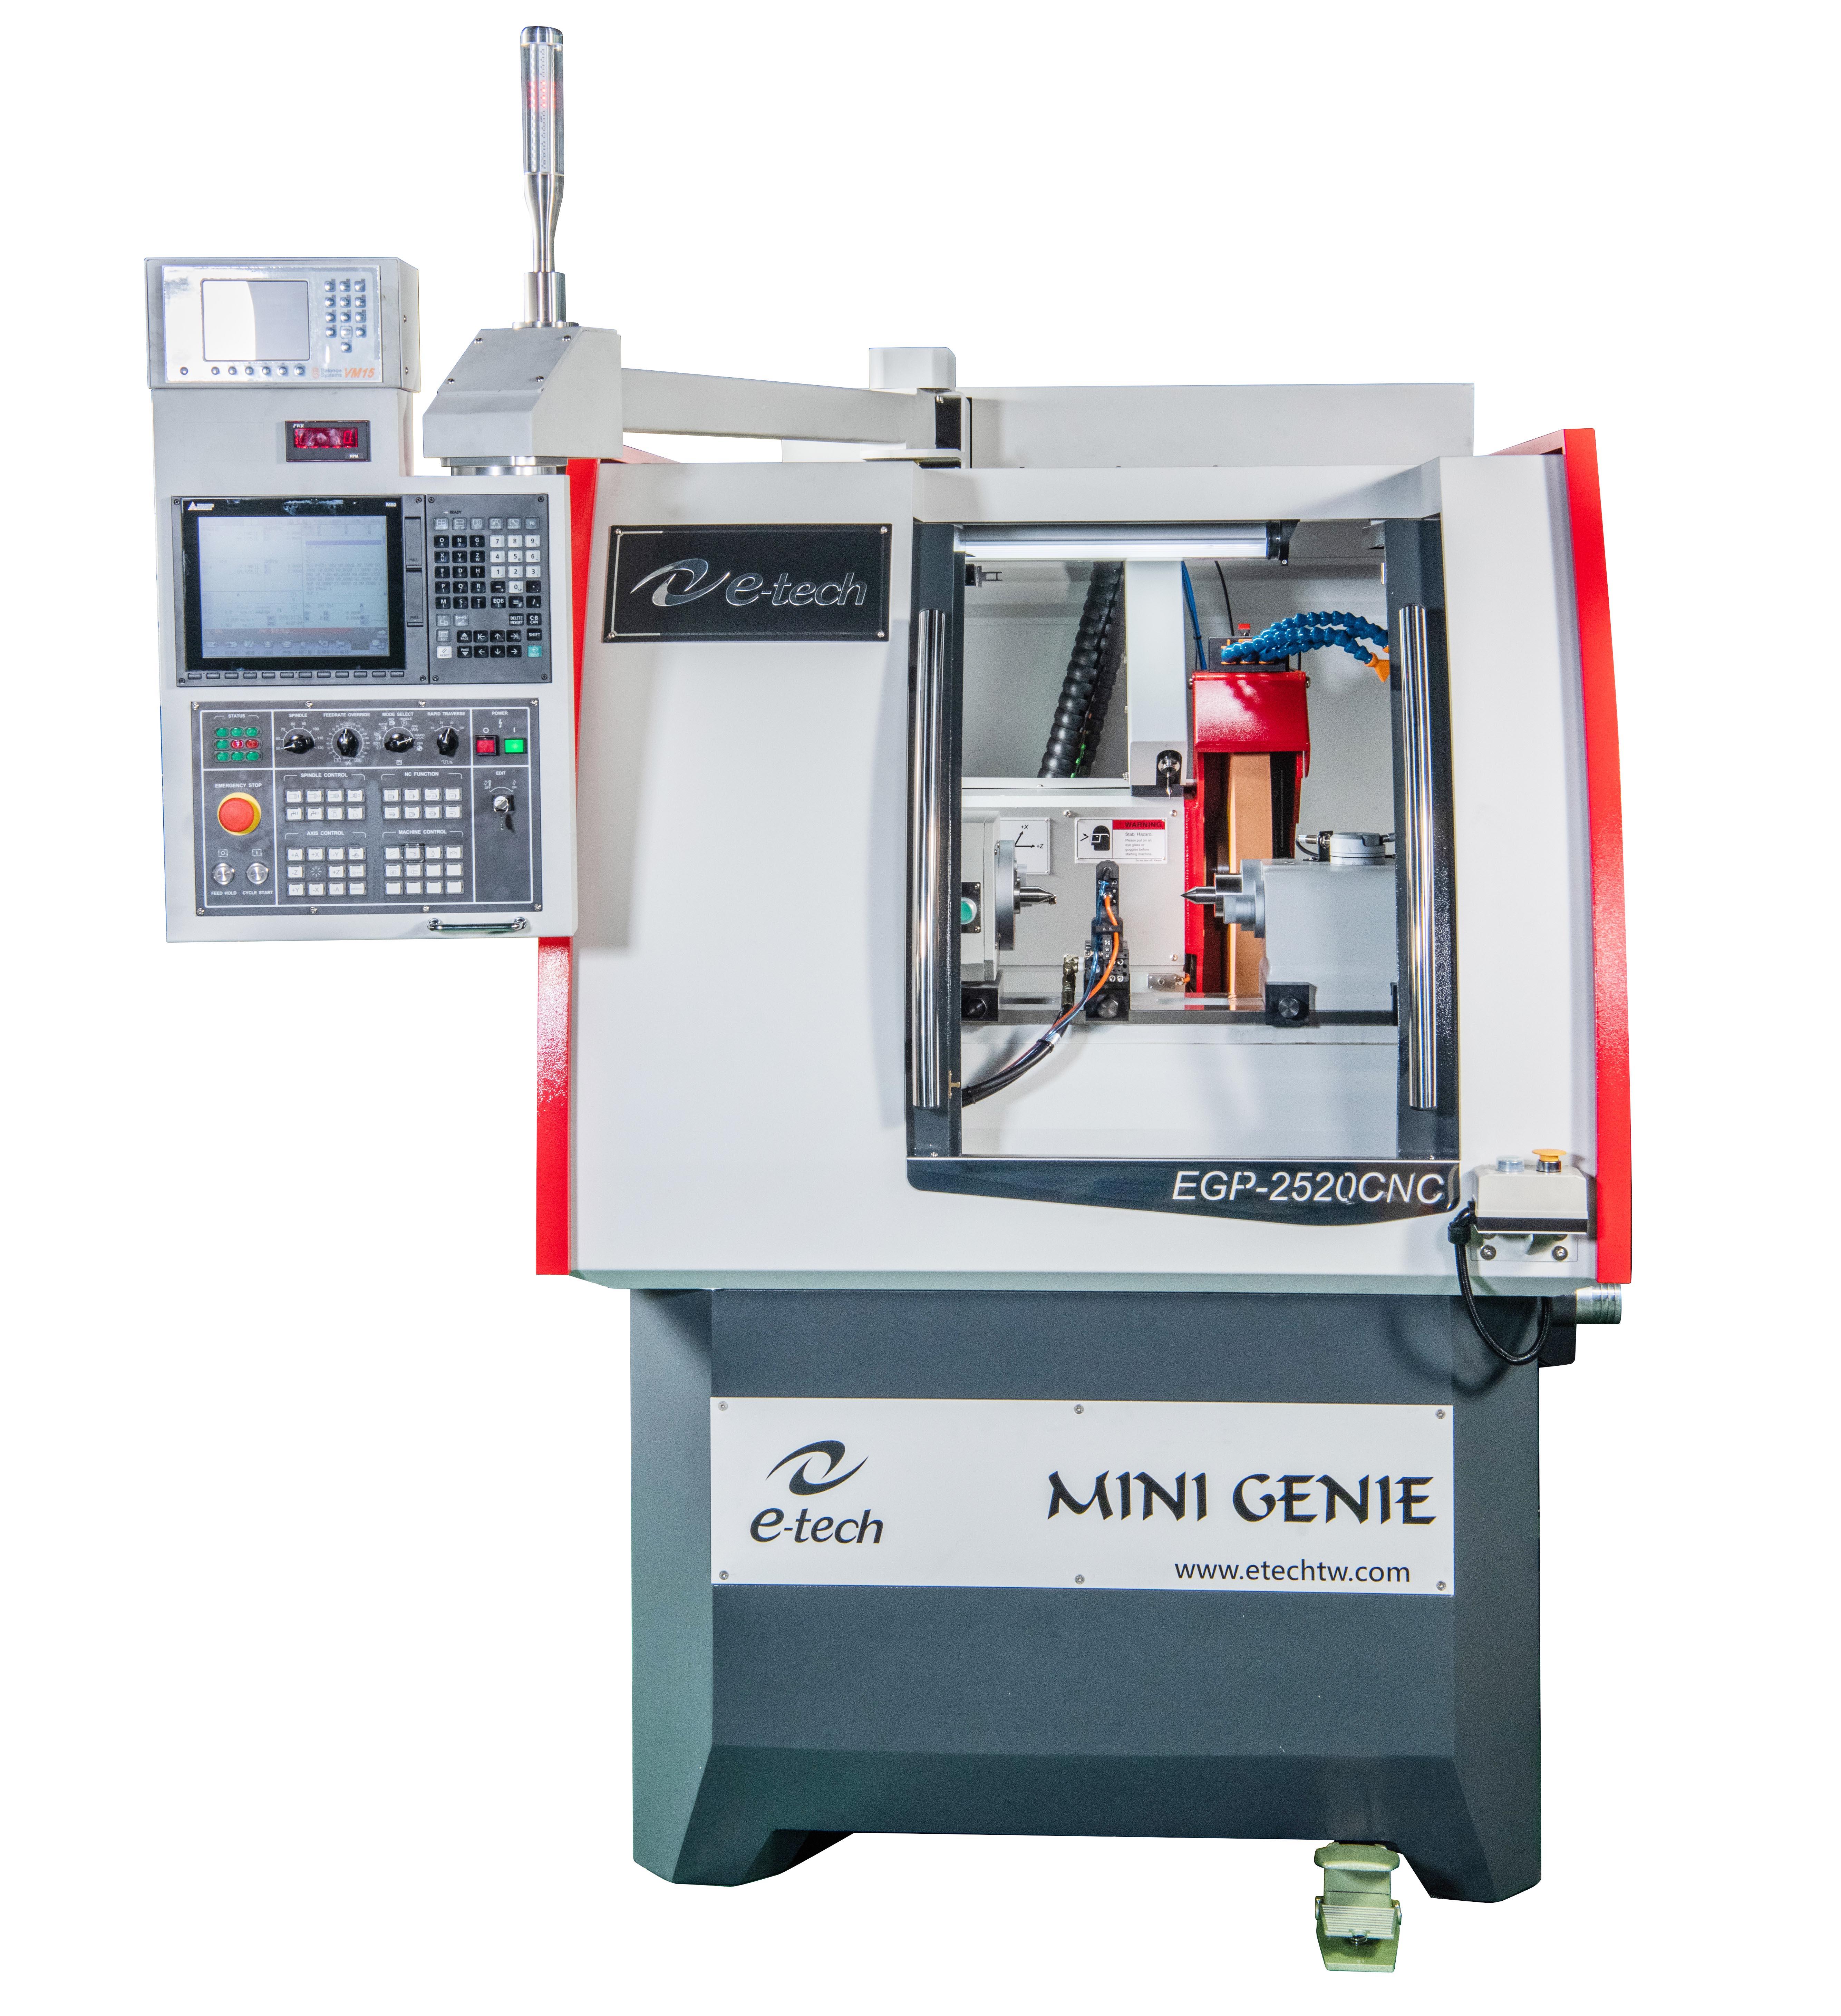 CNC Cylindrical Grinder: Mini Genie